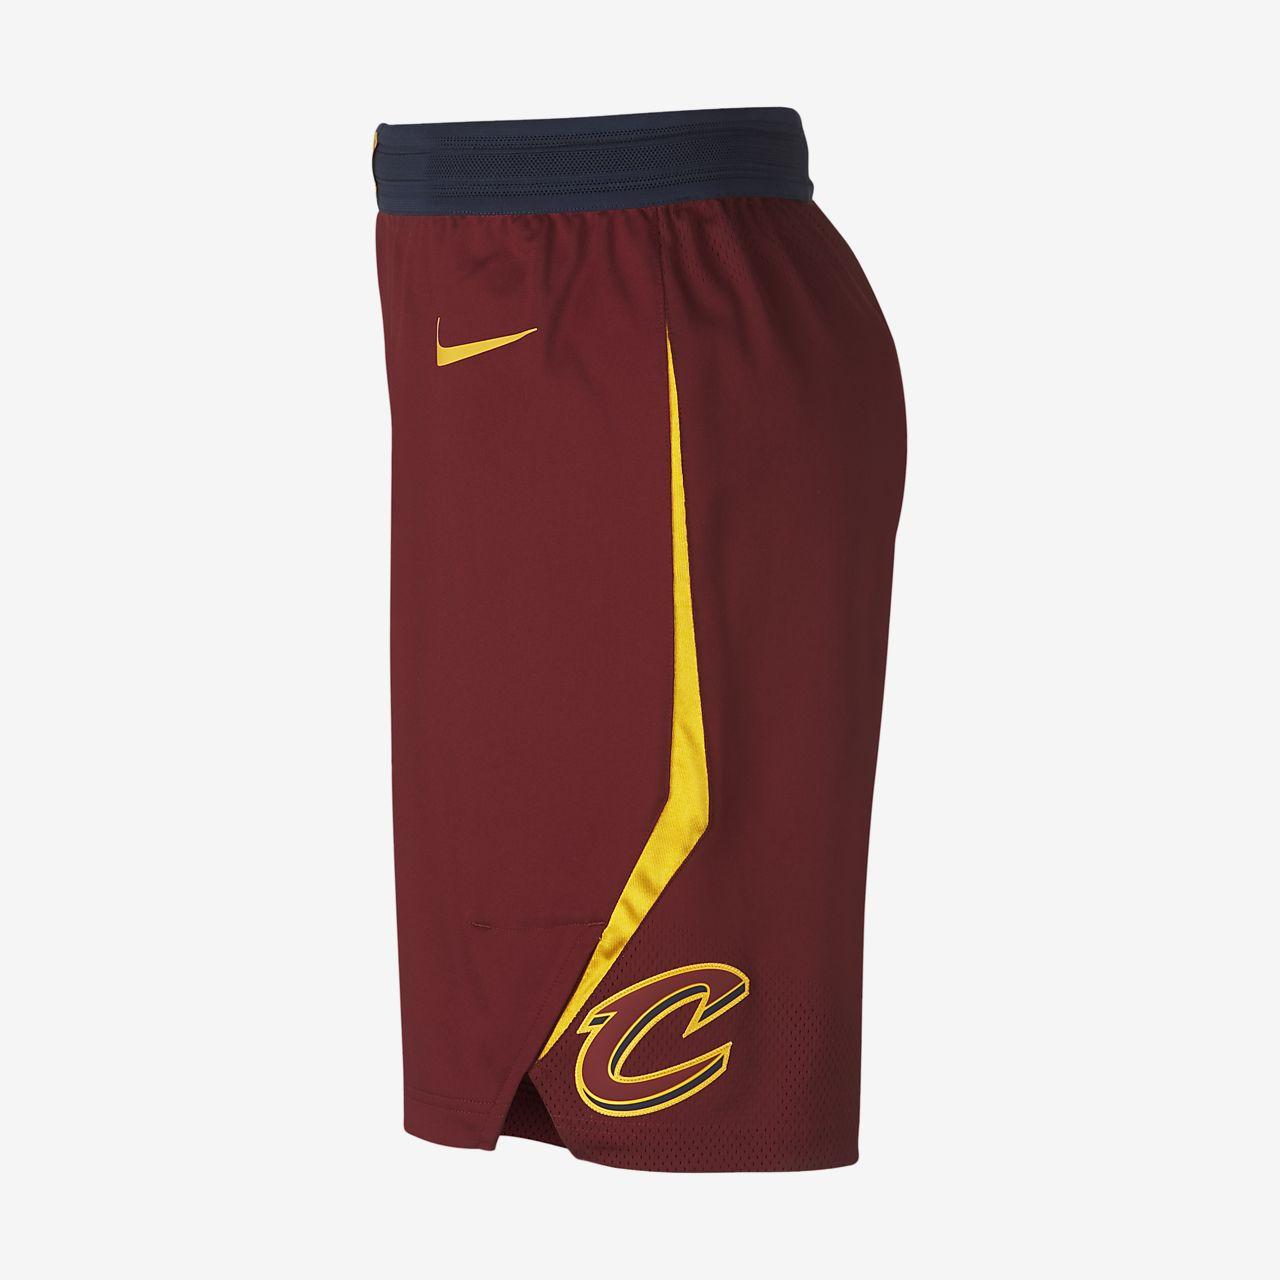 d99f19d3c013 Cleveland Cavaliers Nike Icon Edition Authentic Men s NBA Shorts ...